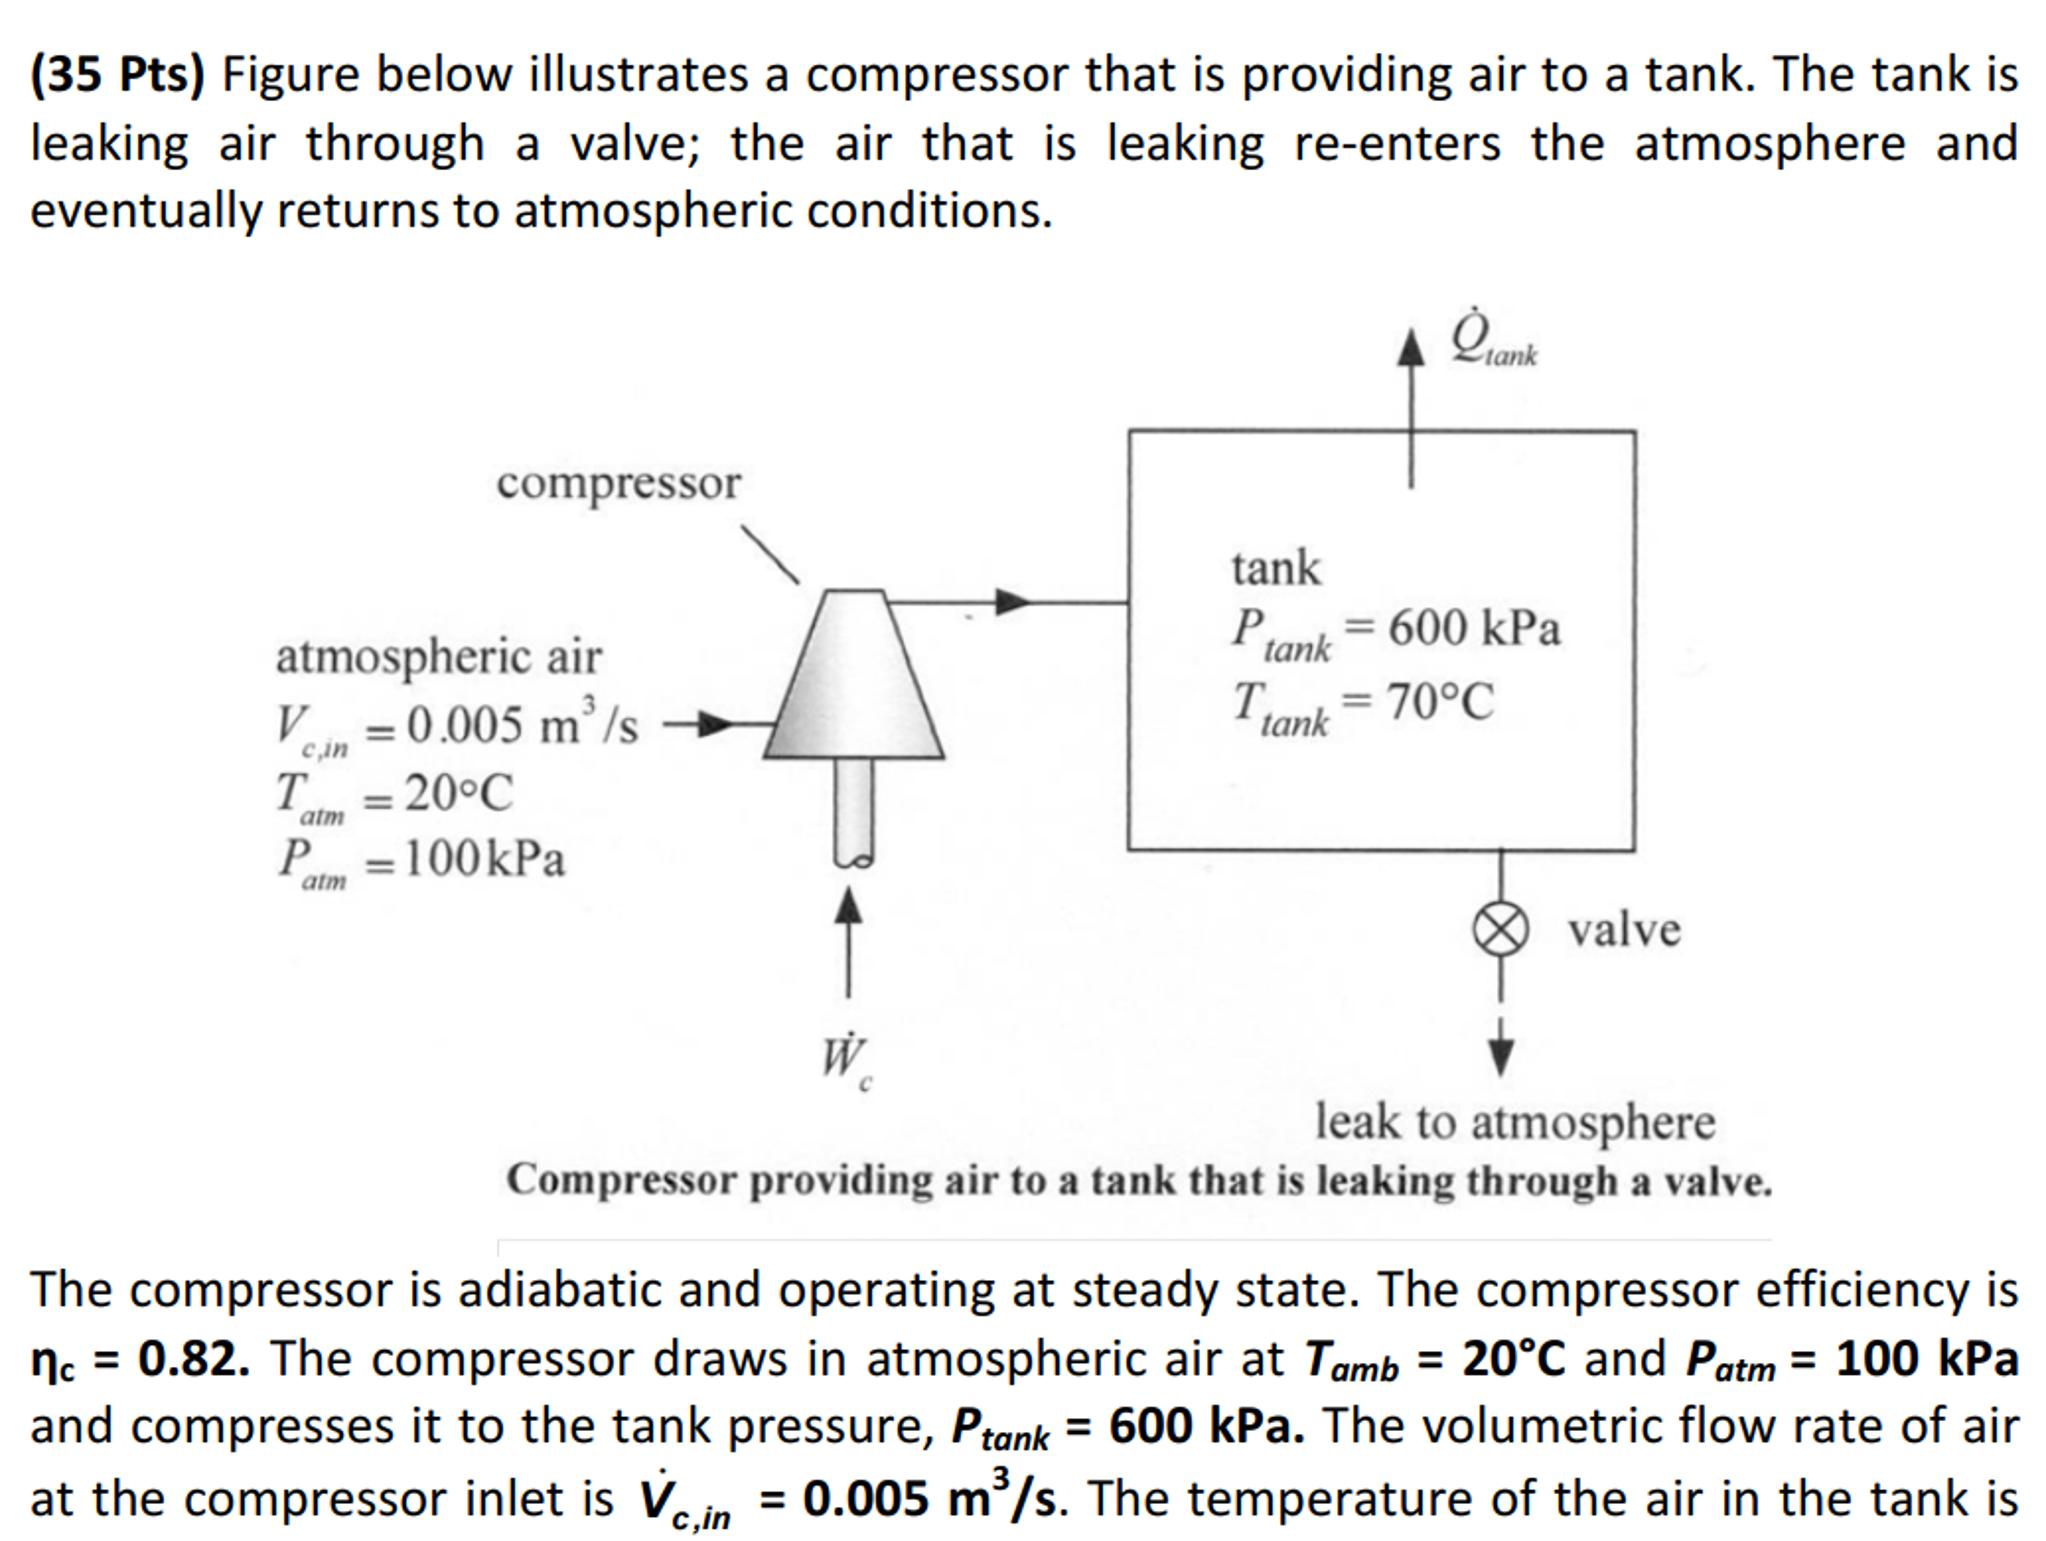 da tank diagram 1 asyaunited de \u2022 Leonardo Da Vinci Designs da tank diagram 8 13 ferienwohnung koblenz guels de u2022 rh 8 13 ferienwohnung koblenz guels de da tank feed water temperature deaerator tank